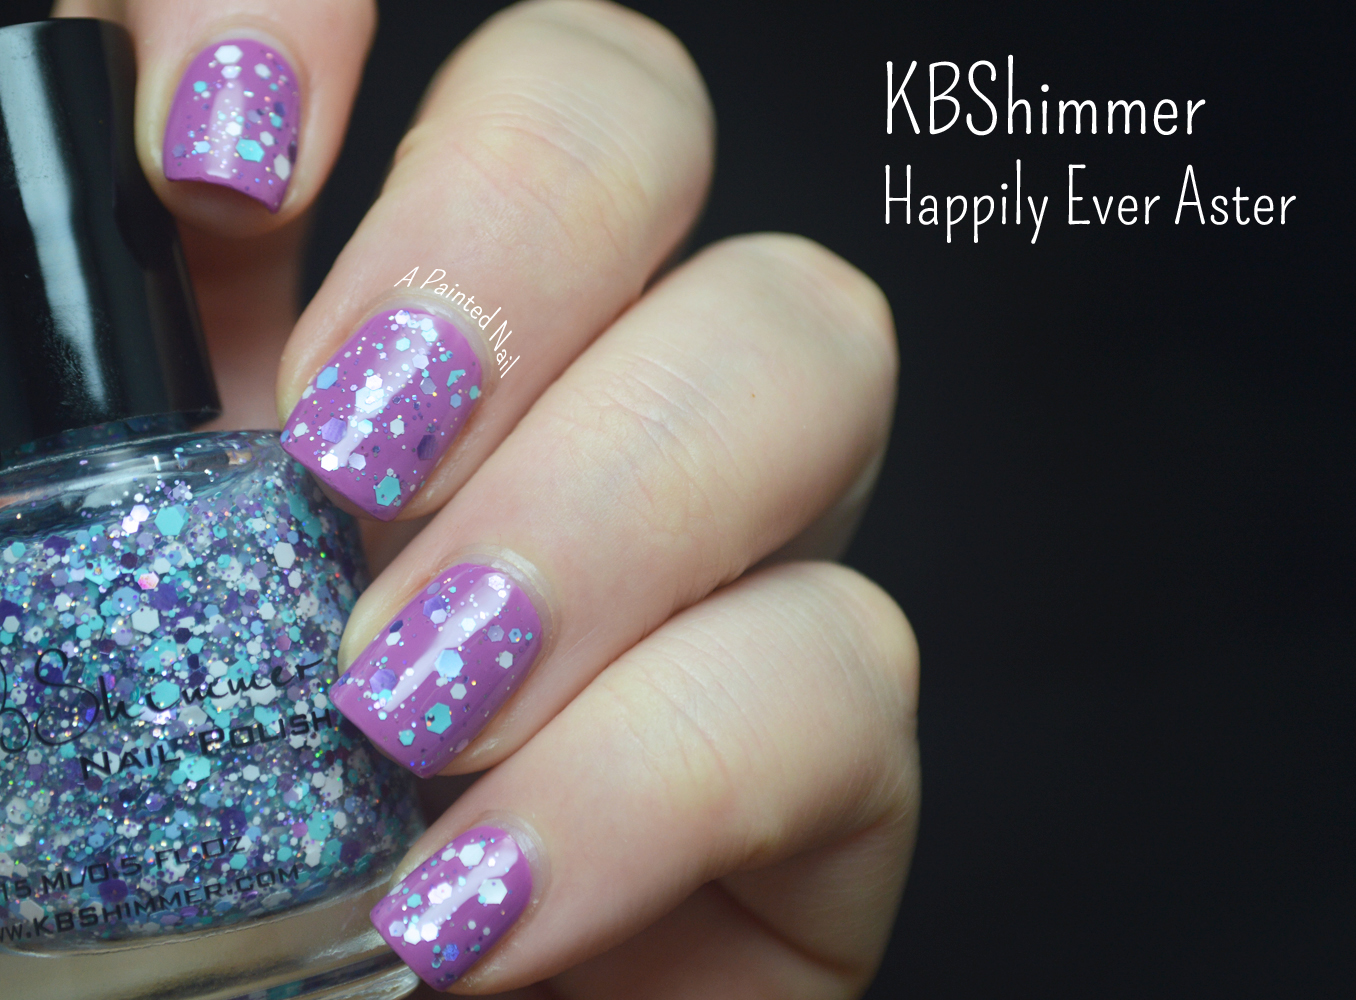 KBShimmer Happily Ever Aster